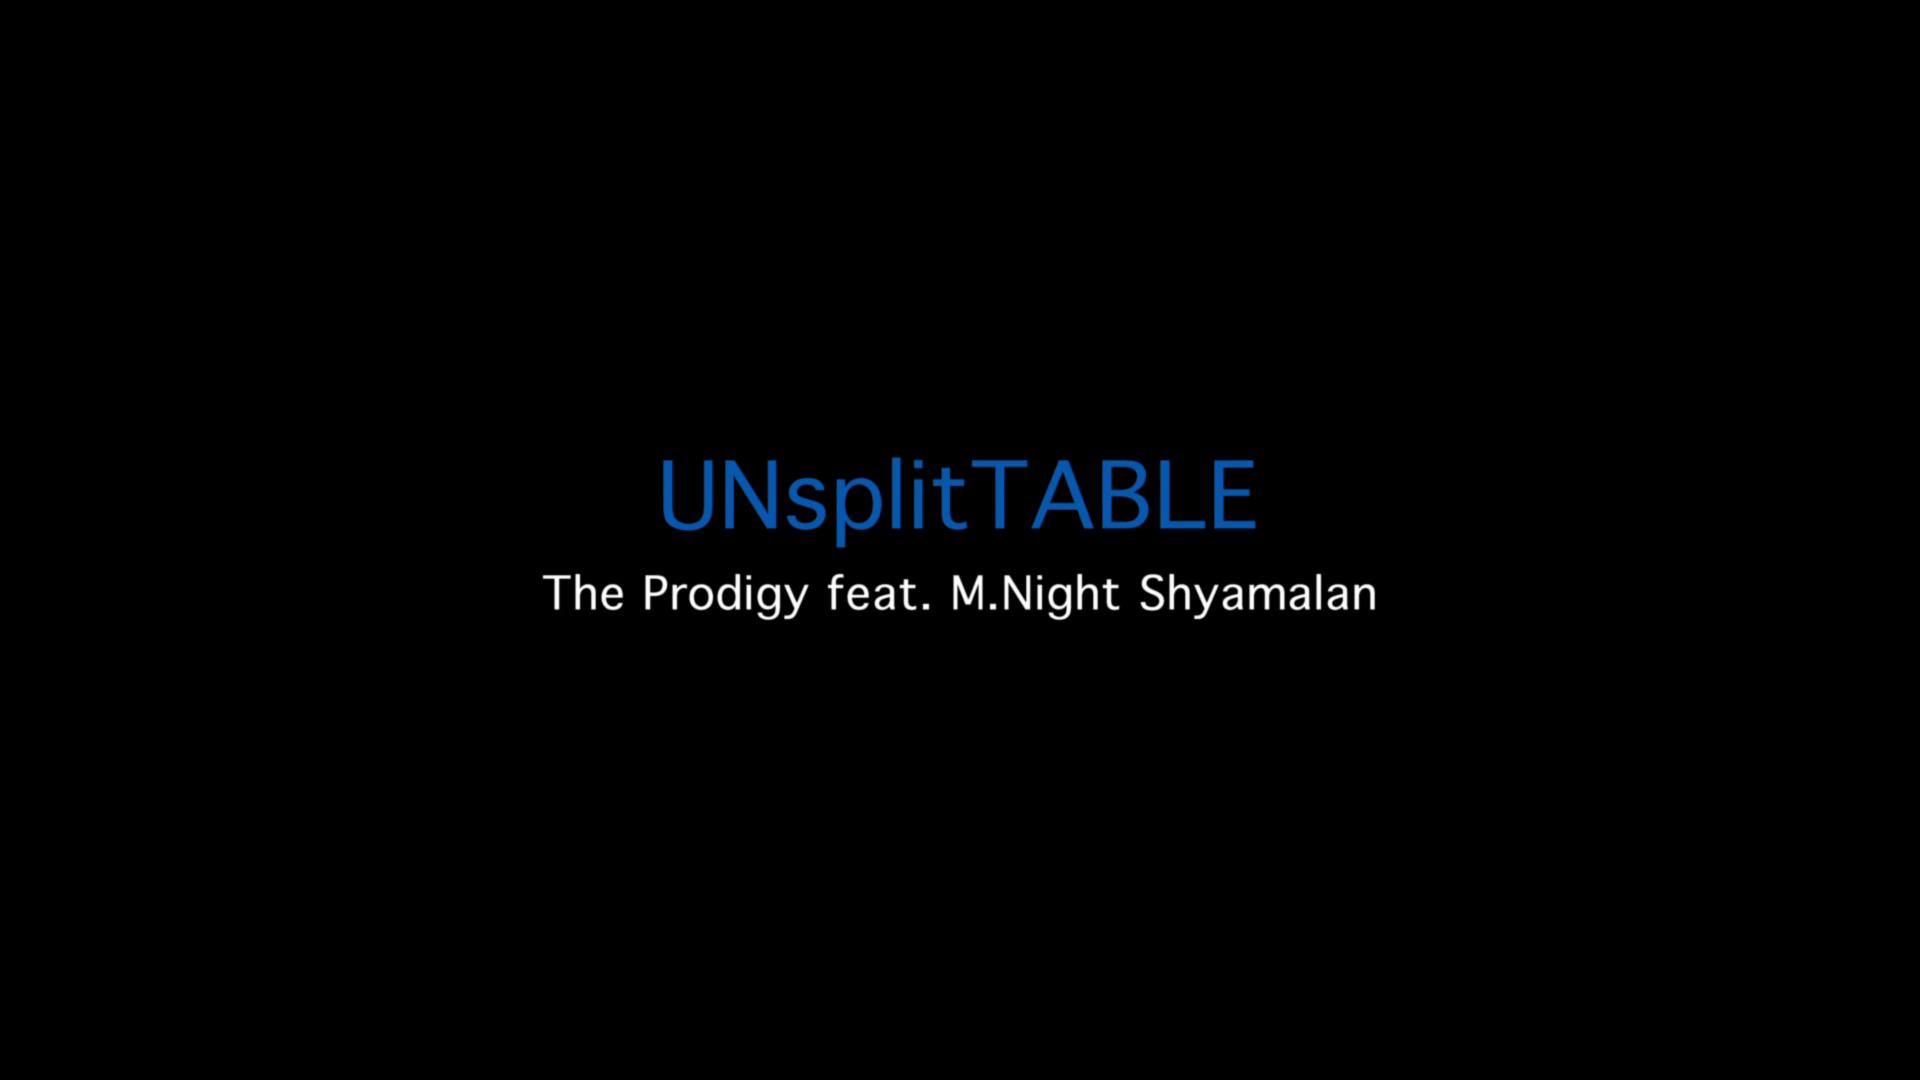 Unsplittable